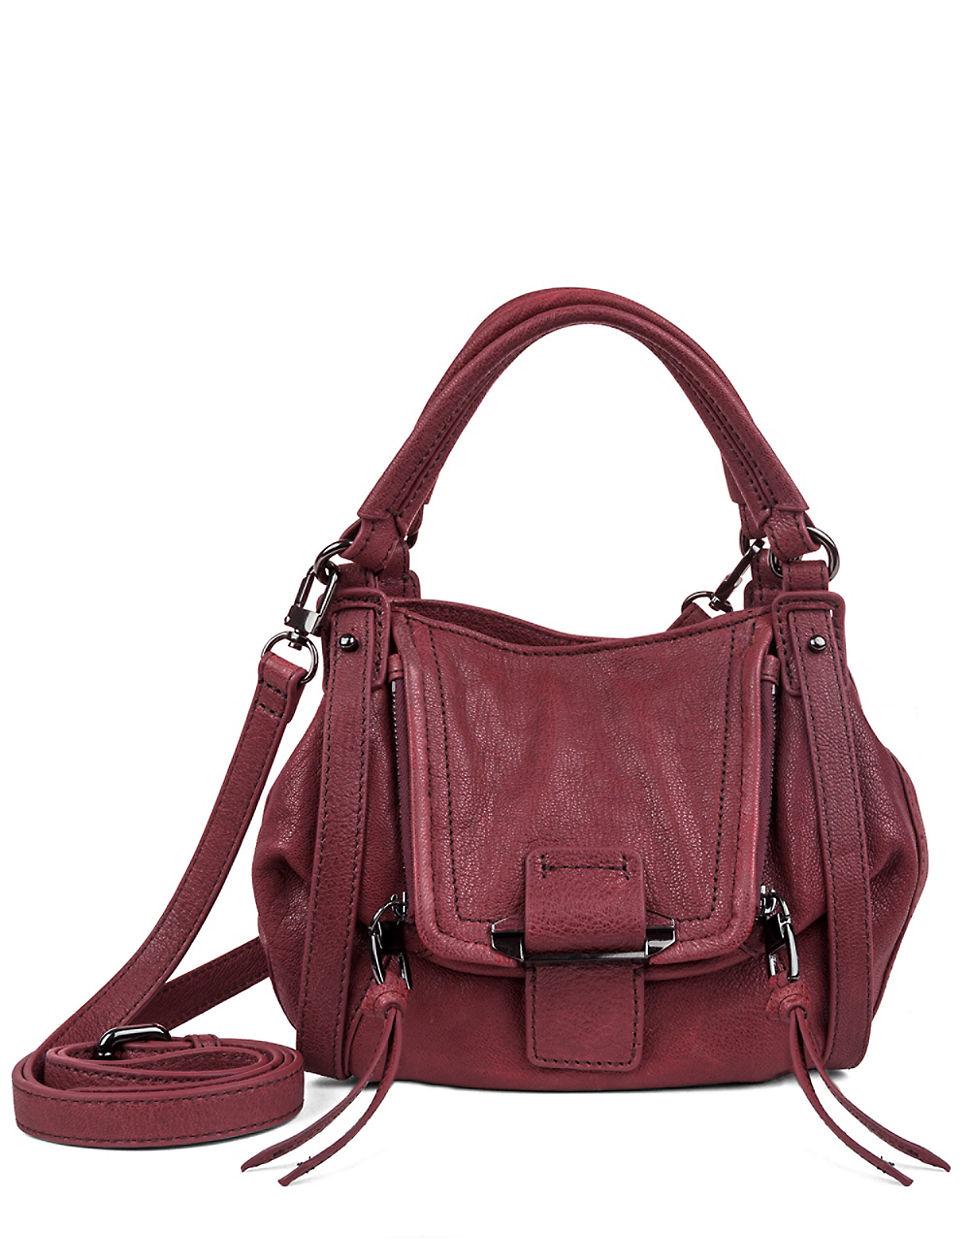 643e58b788 Kooba Mini Jonnie Leather Crossbody Bag - Lyst